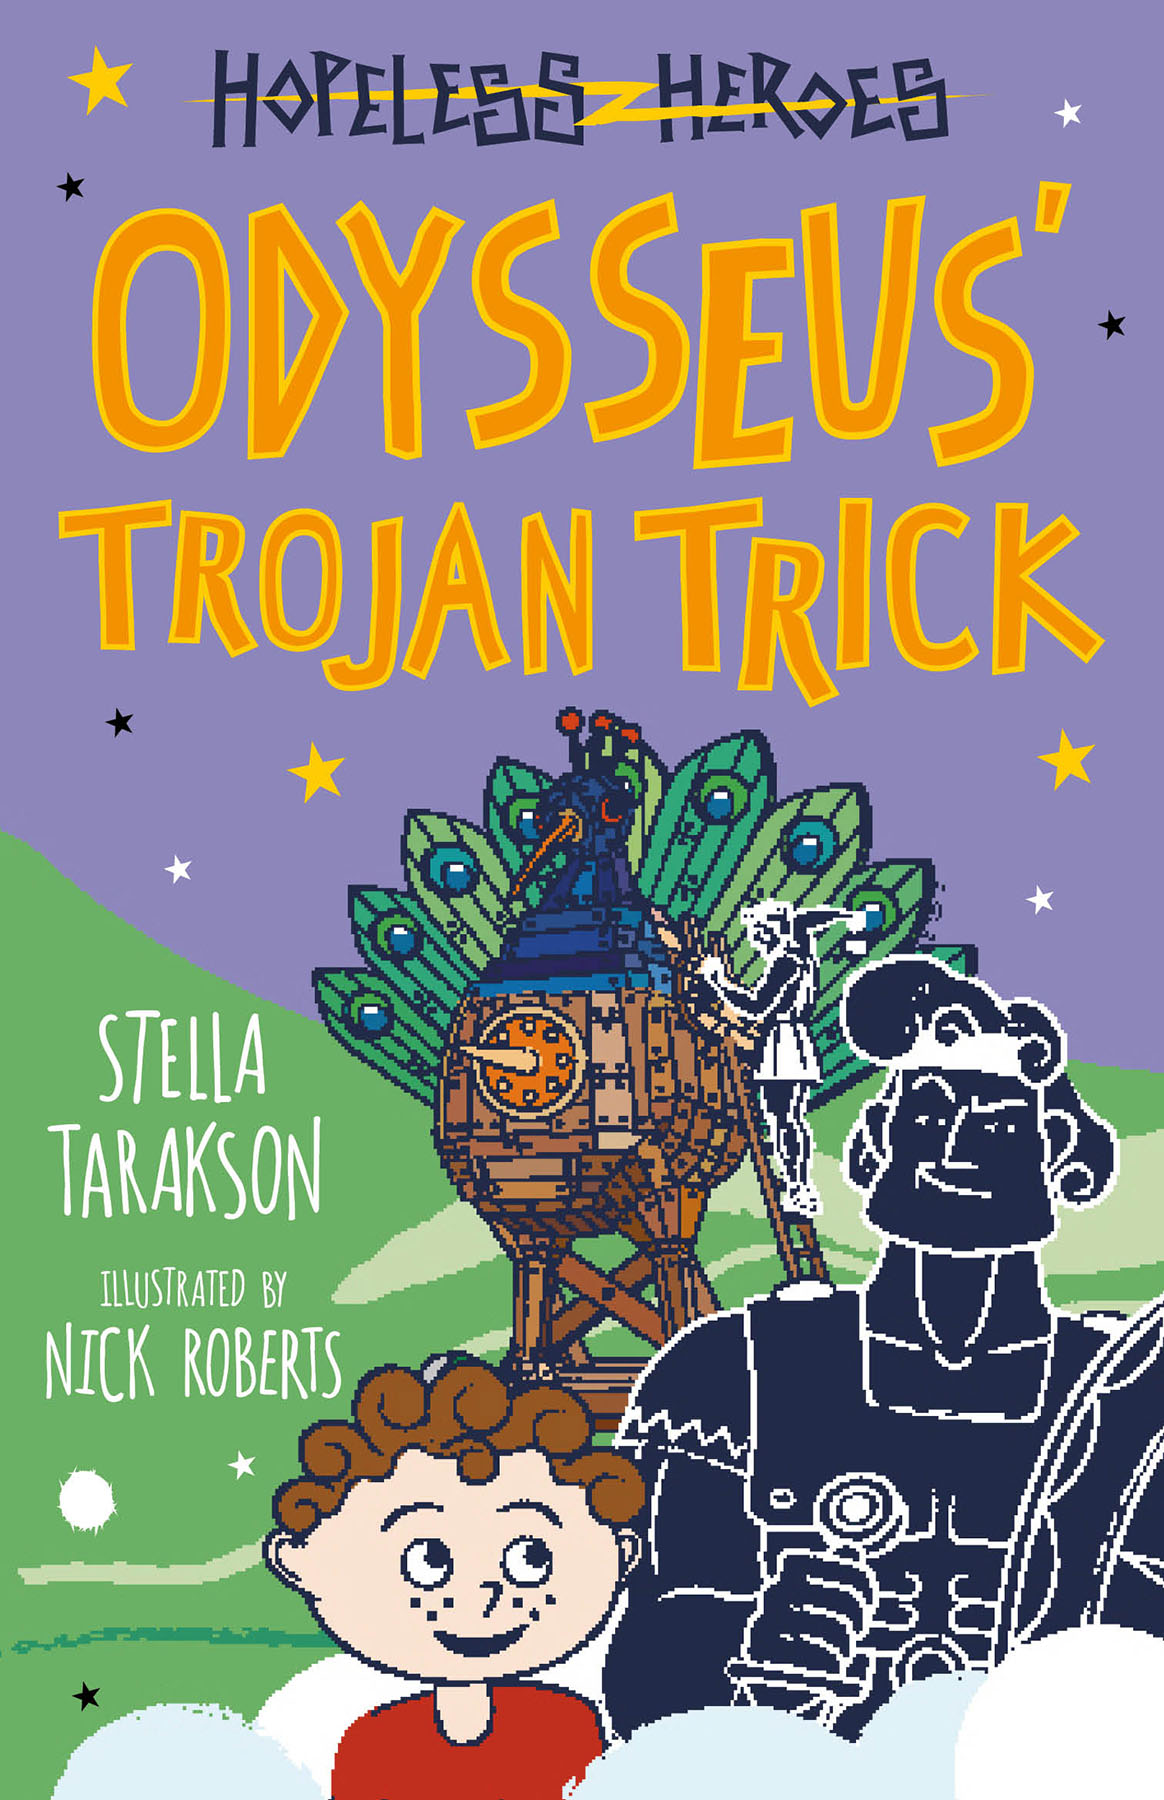 Odysseus' Trojan Trick (Hopeless Heroes, #8)